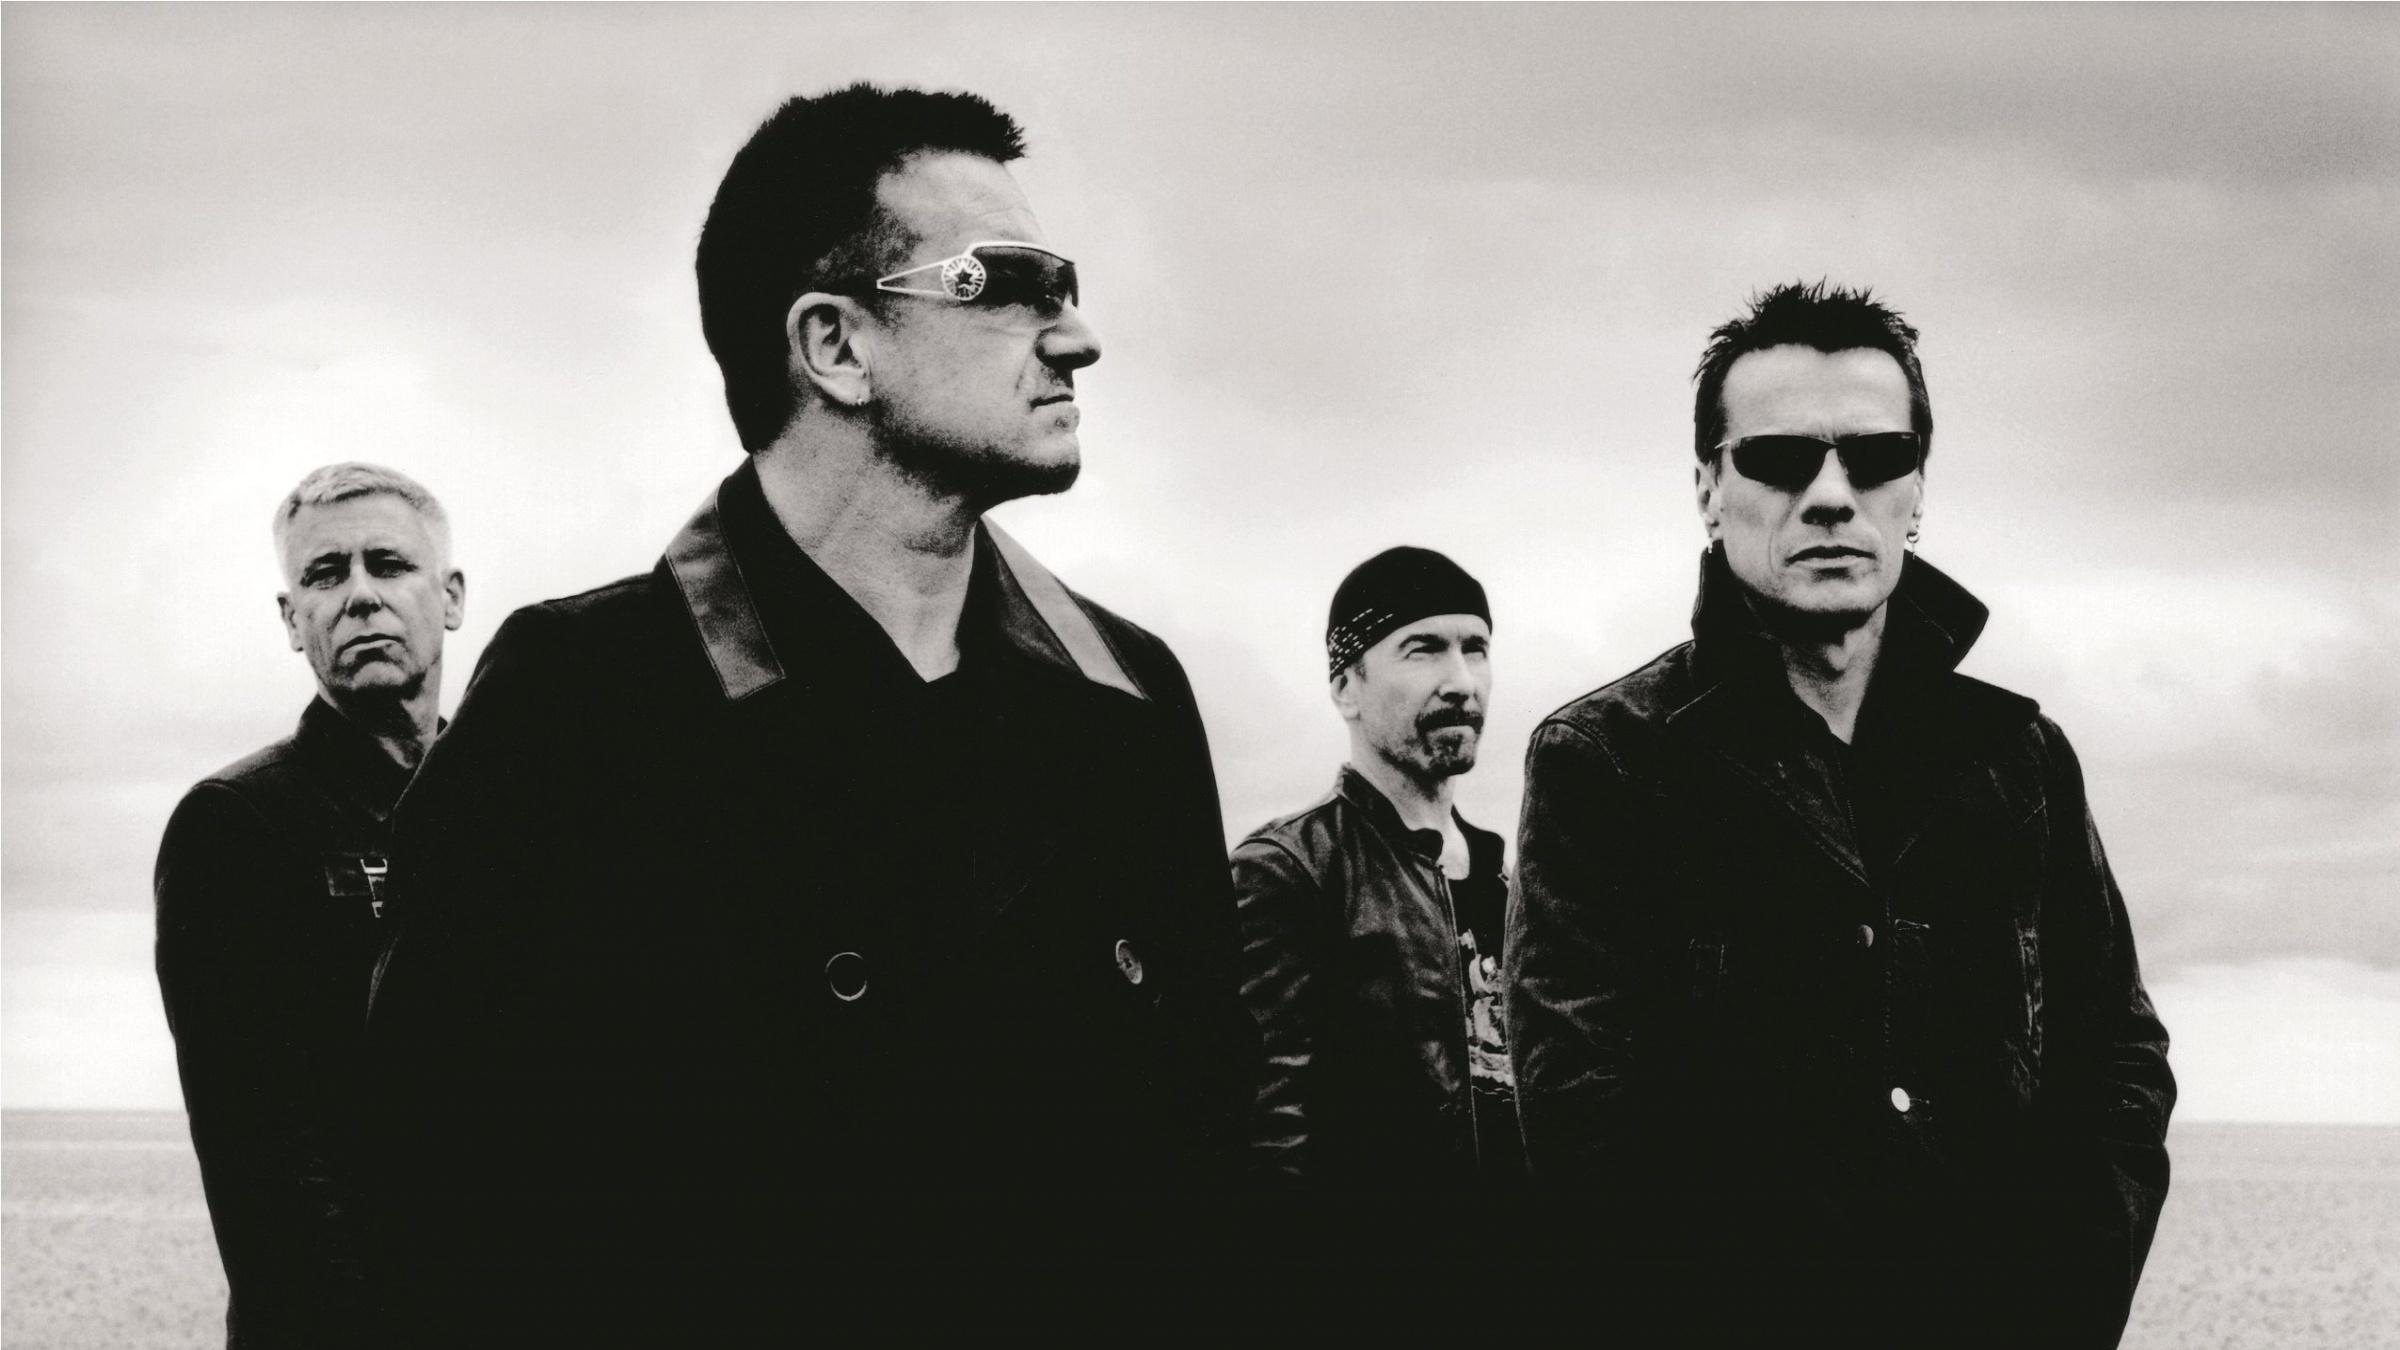 U2 rock band 2400x1350